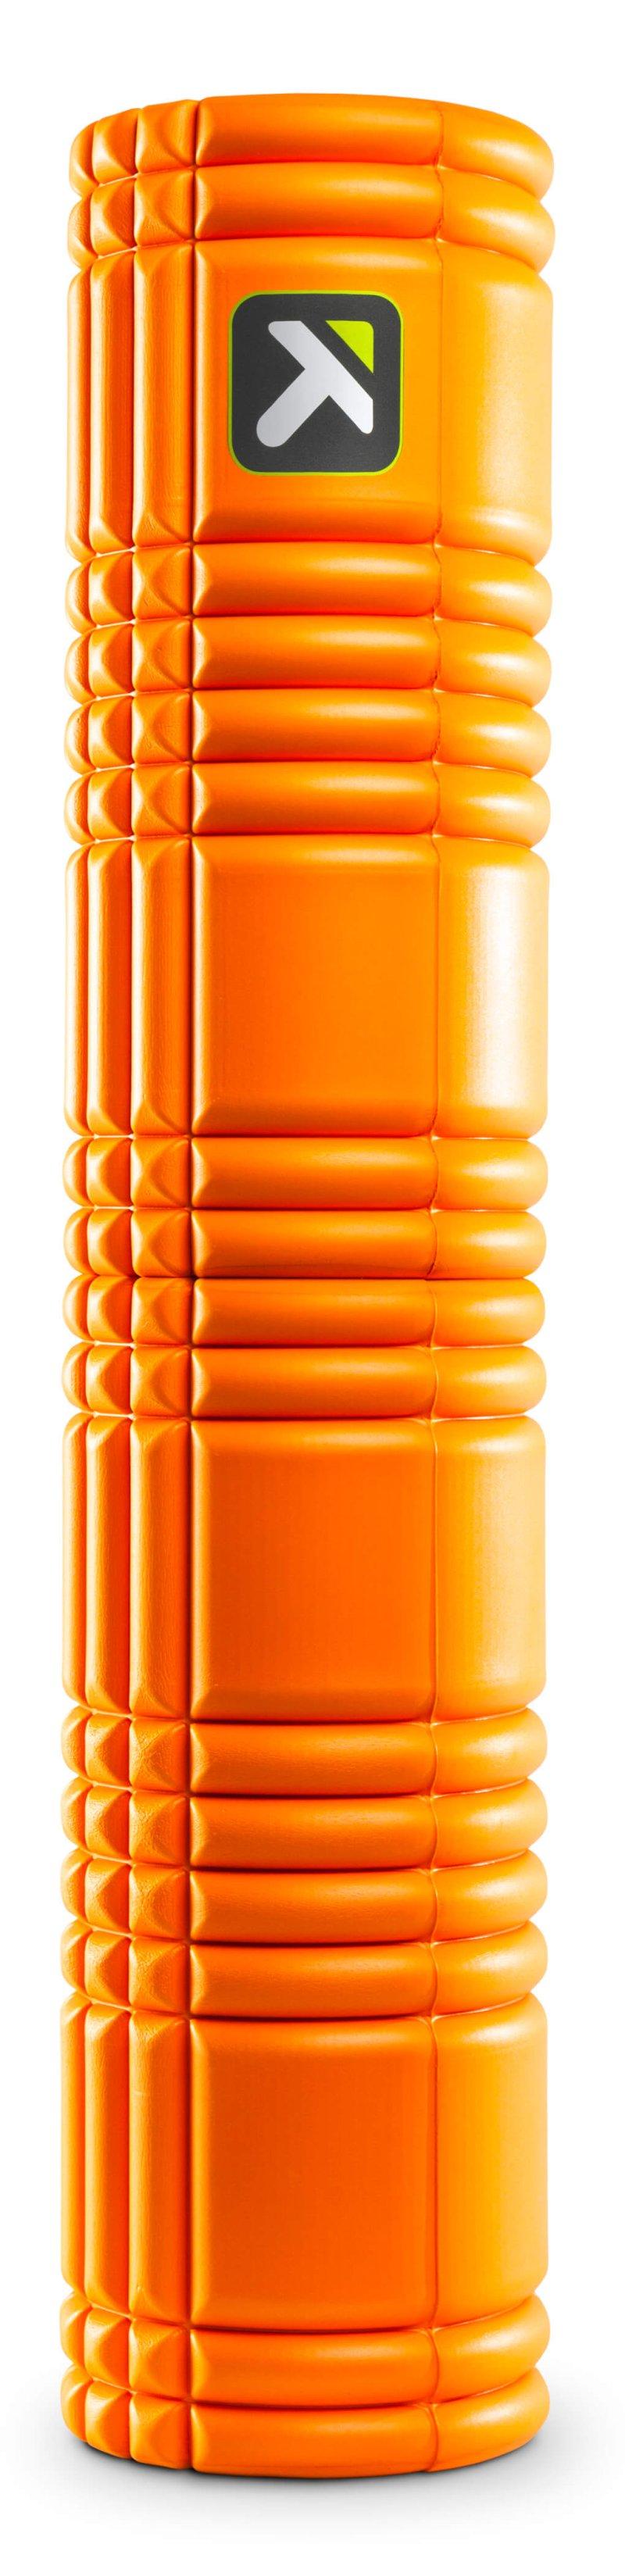 Triggerpoint  THE GRID 2.0 foam roller